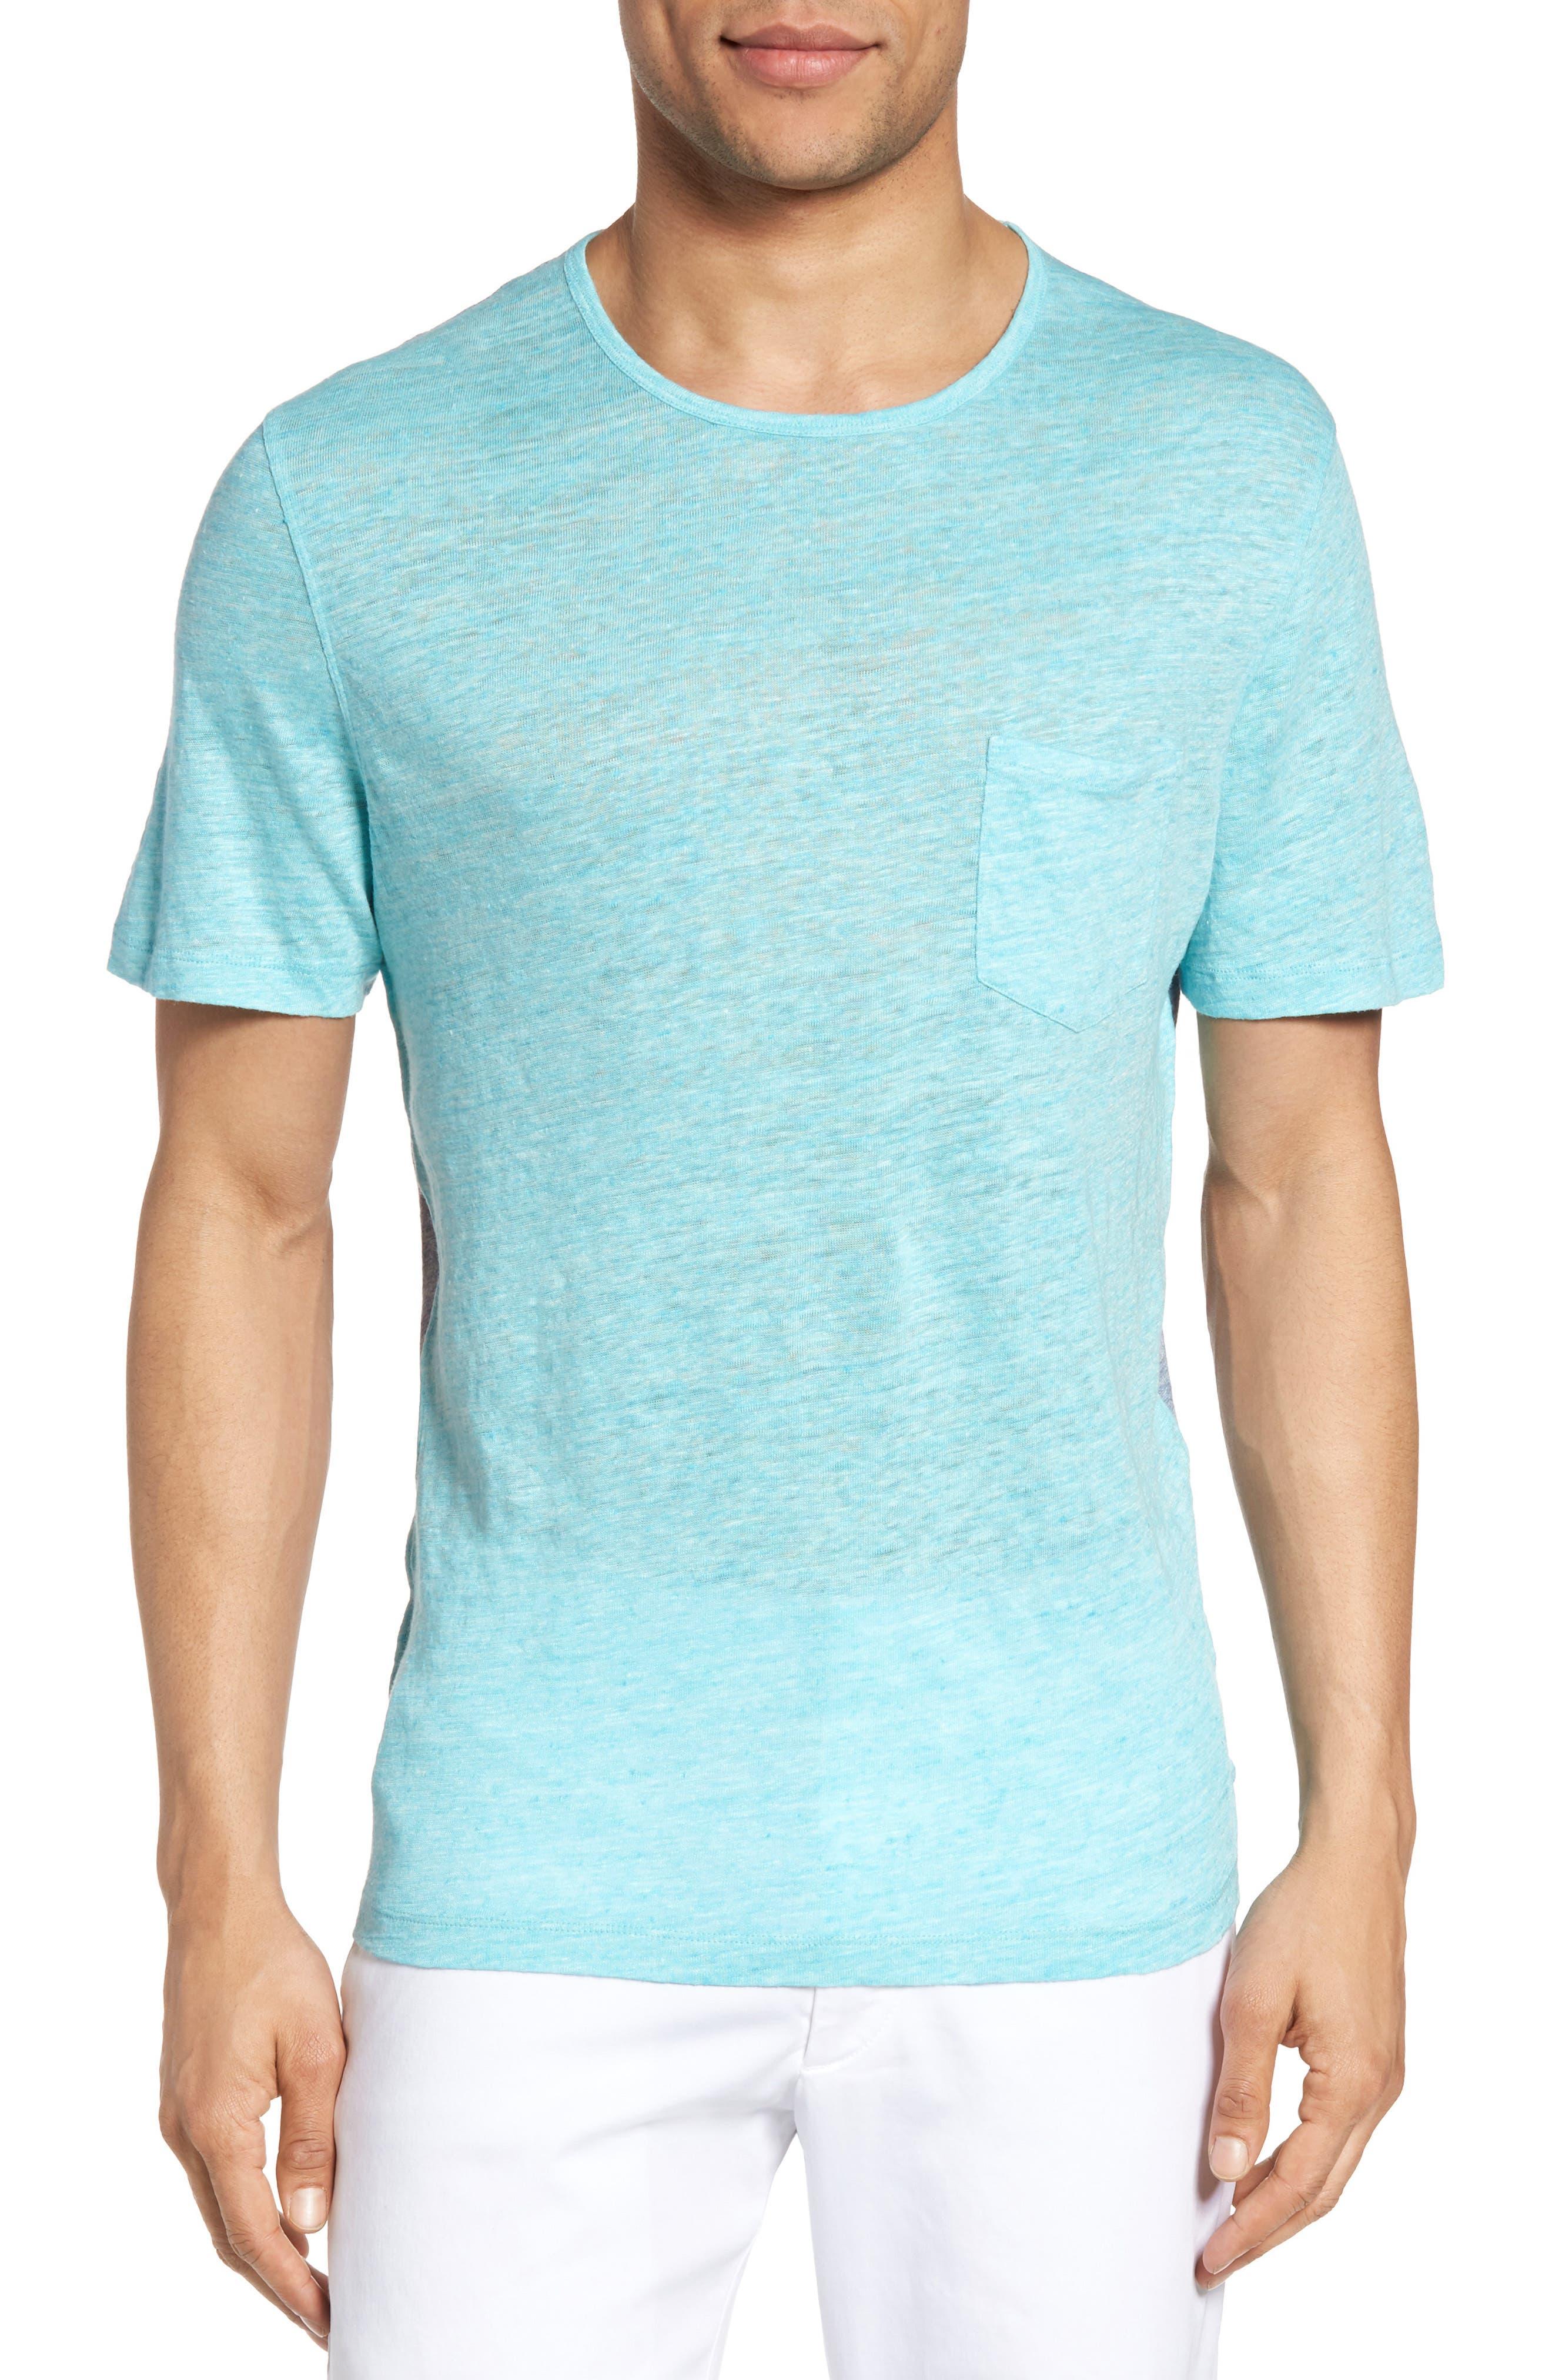 Alternate Image 1 Selected - Zachary Prell Monad Colorblock Linen T-Shirt